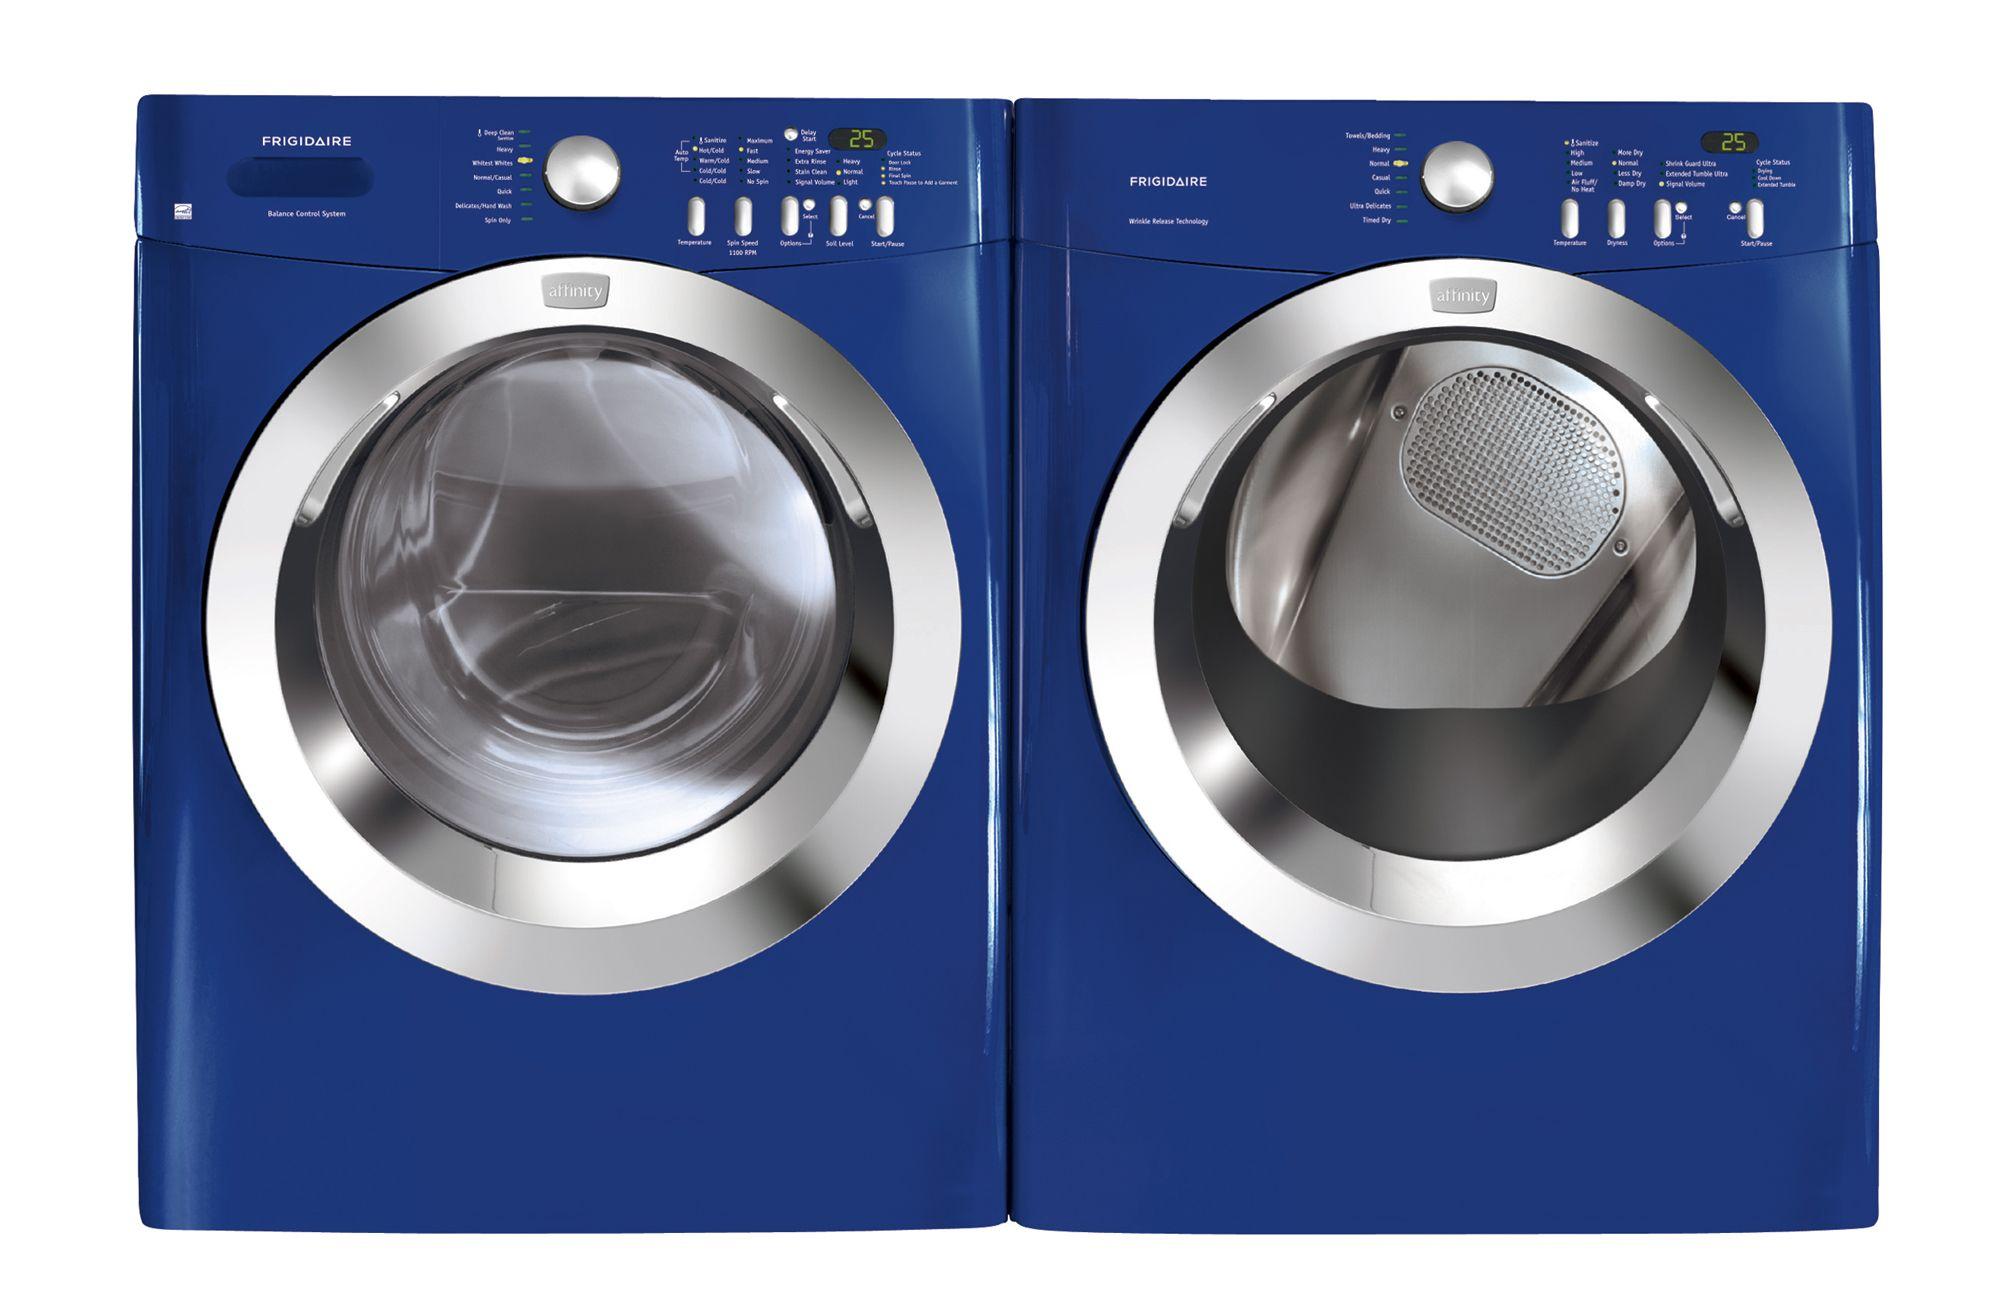 Frigidaire Affinity 7.0 cu. ft. Gas Dryer - FAQG7077K